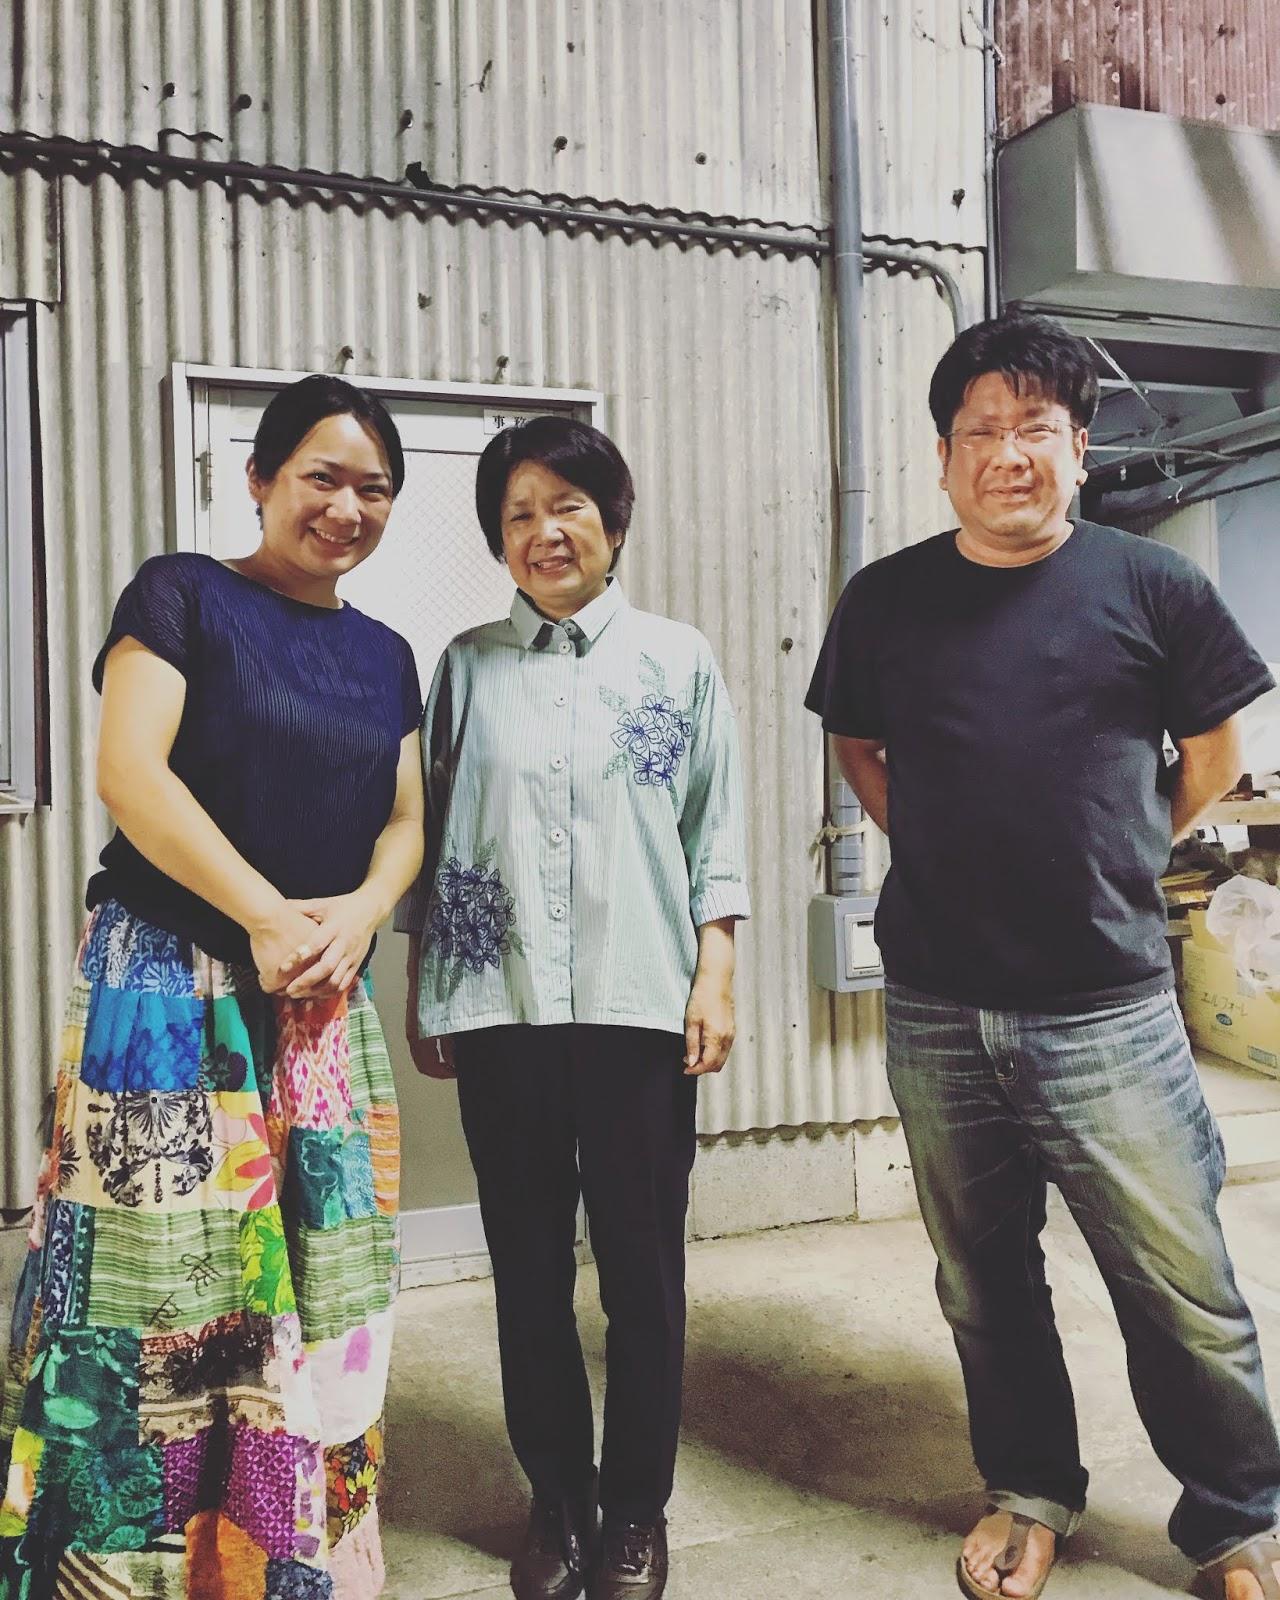 Ayumi, Yayoko et Hiro (JP), JP